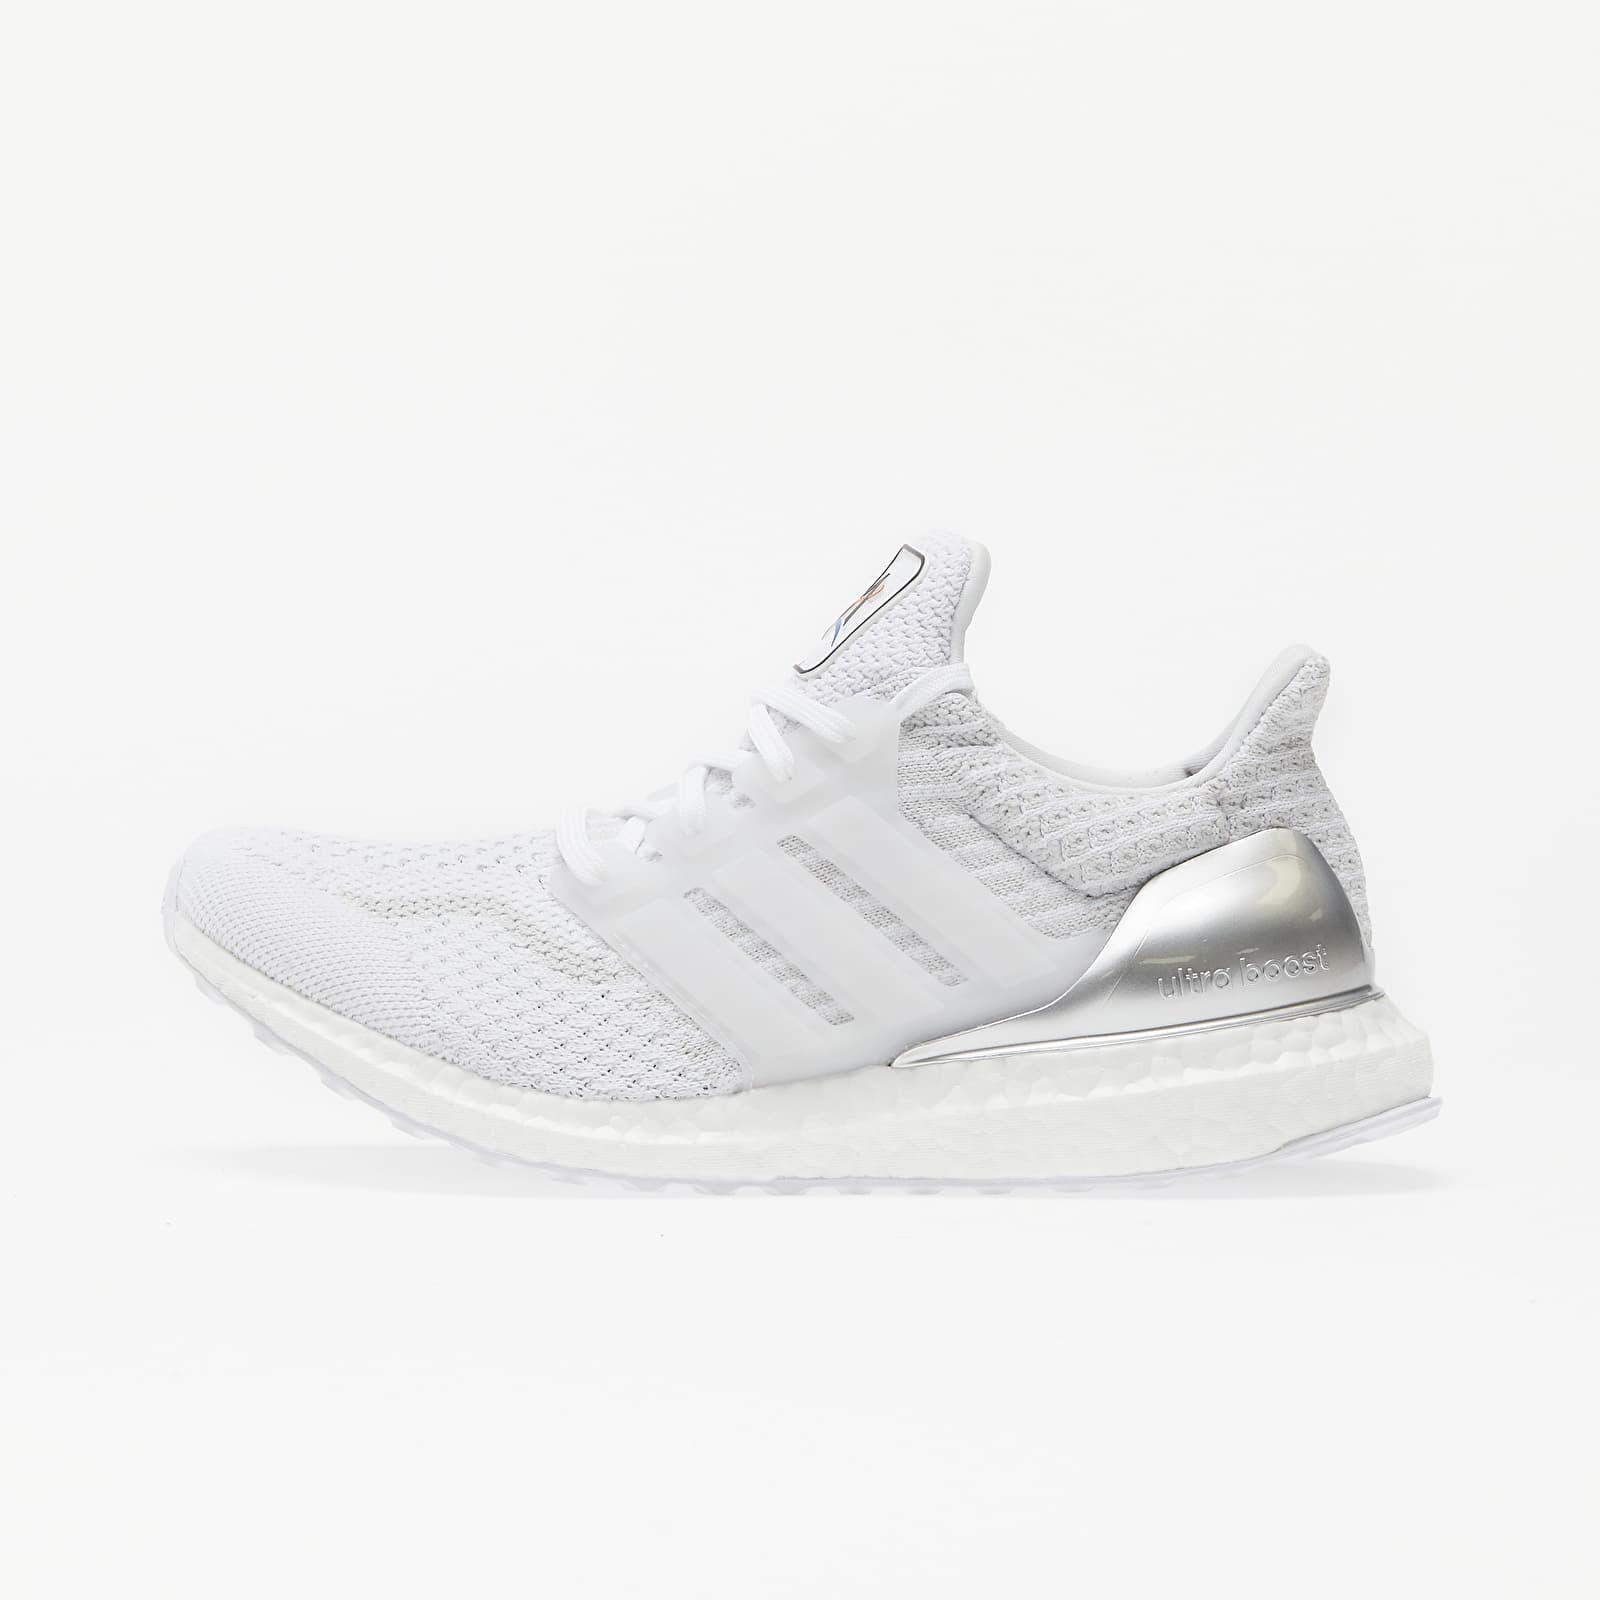 Dámske topánky a tenisky adidas UltraBOOST 5.0 DNA W Ftwr White/ Ftwr White/ Grey One